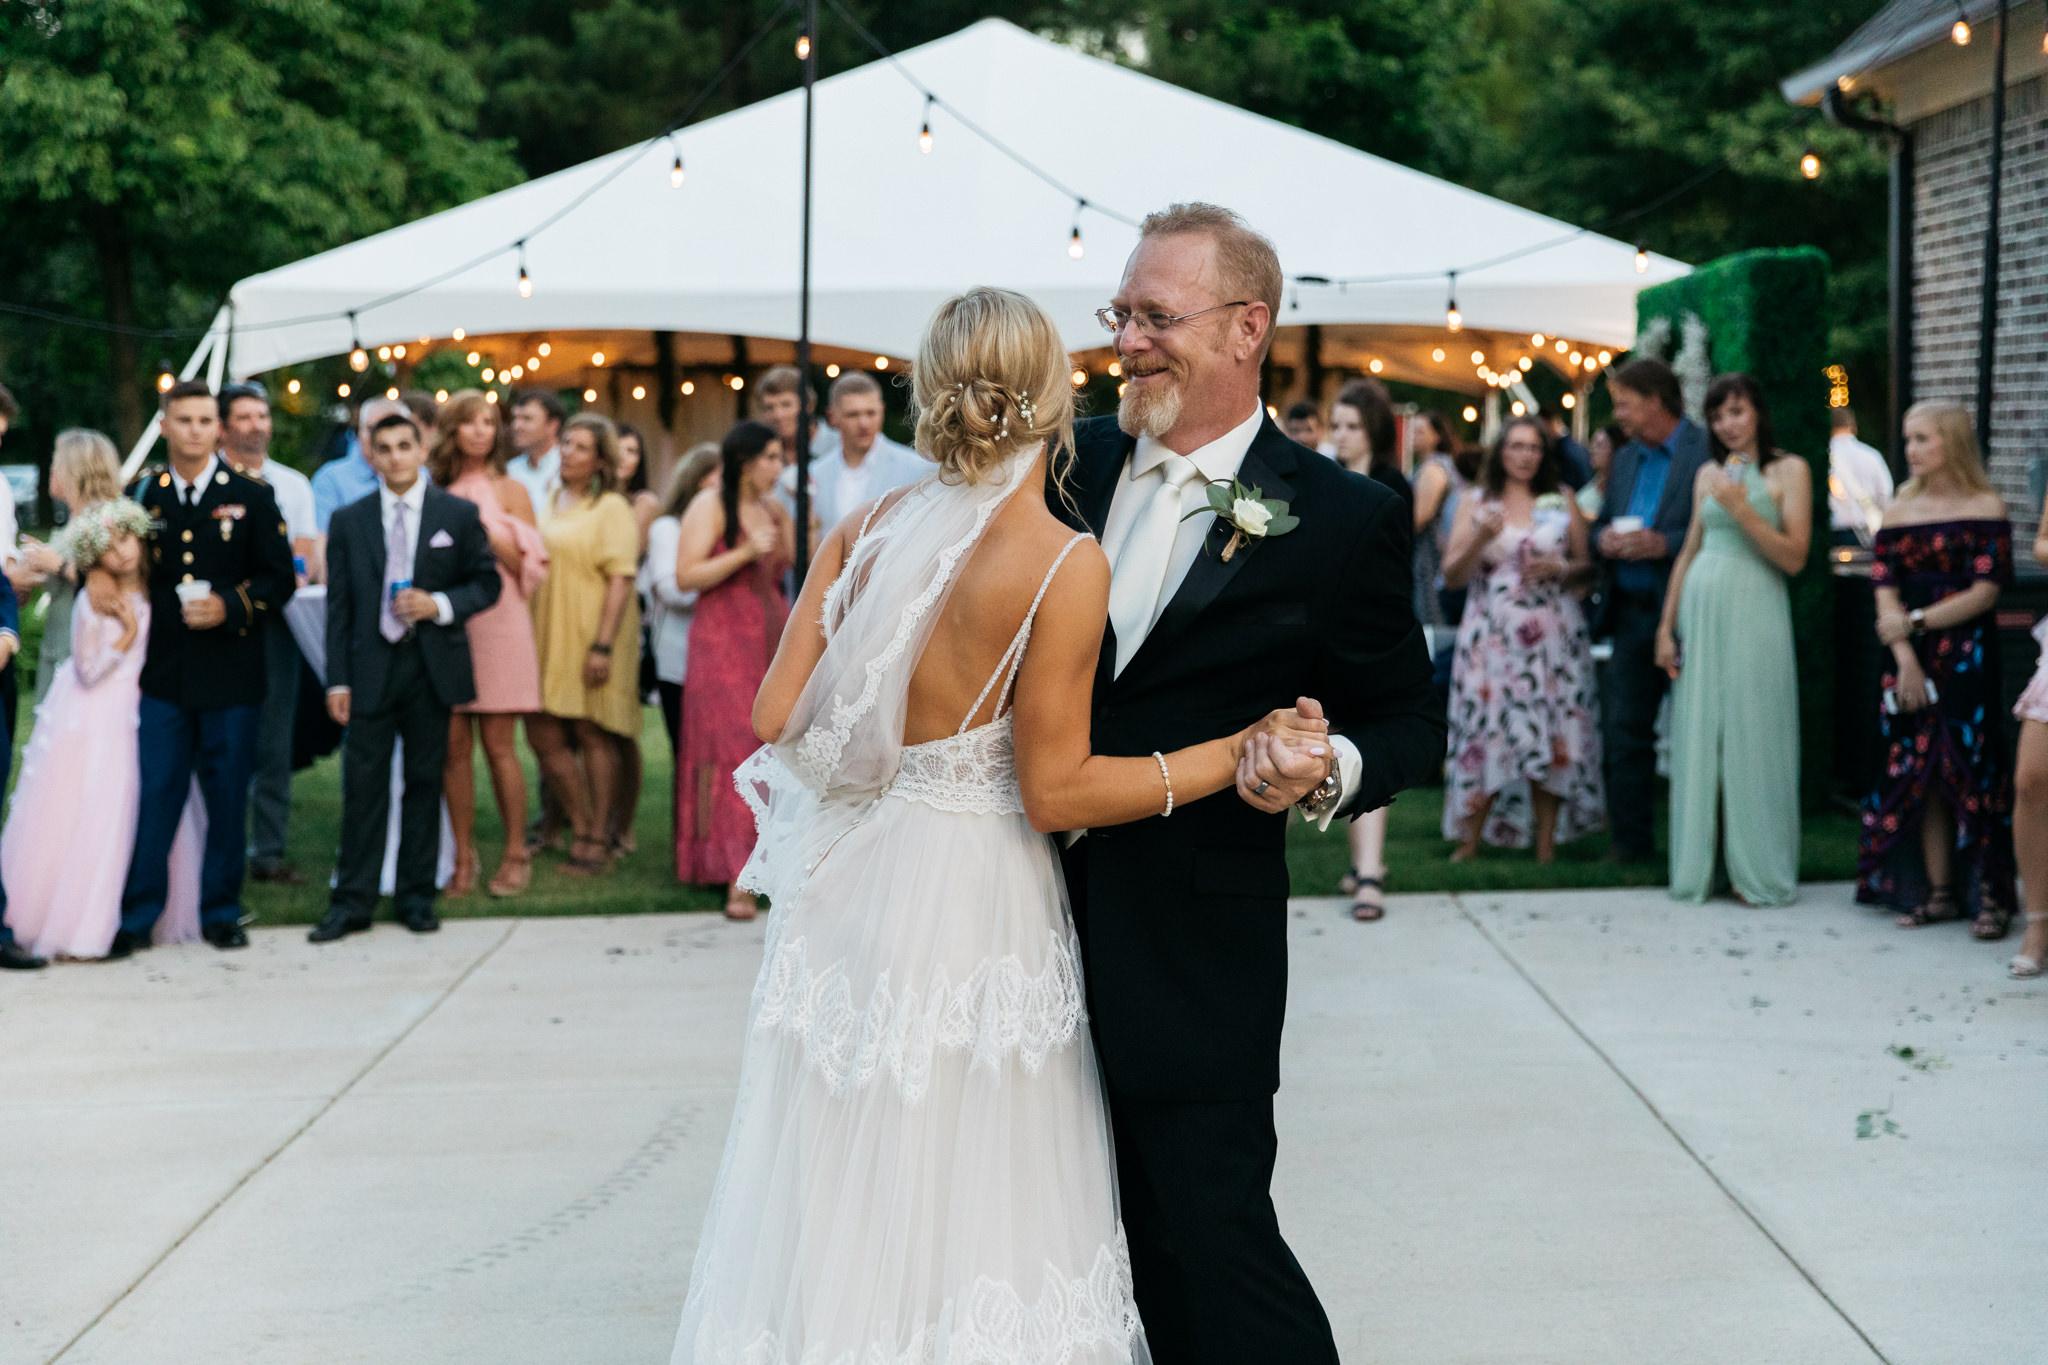 backyard-wedding-thewarmtharoundyou-lexy-branson-28.jpg